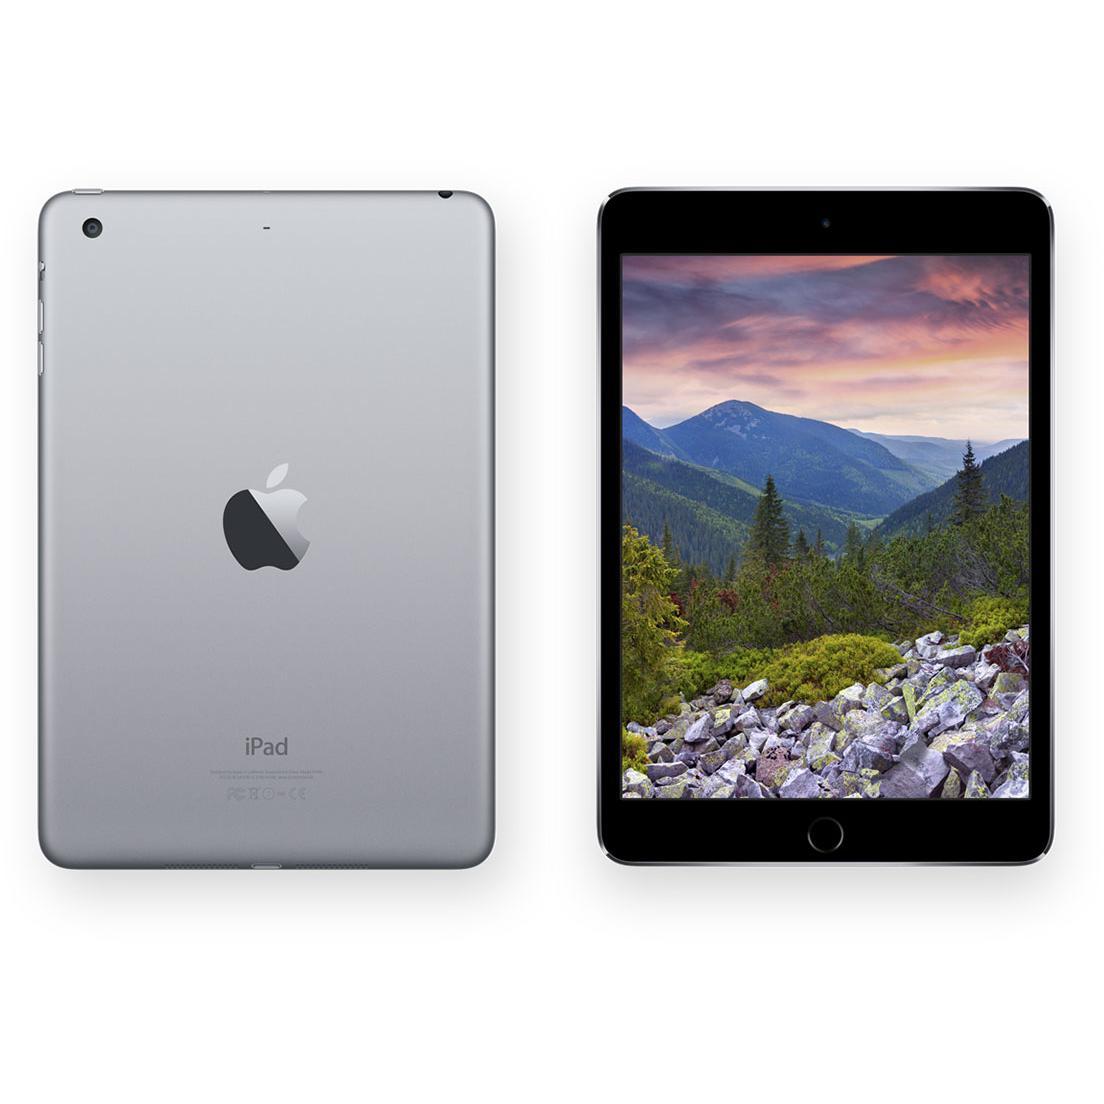 iPad mini 3 128 GB 4G - Spacegrau - Ohne Vertrag